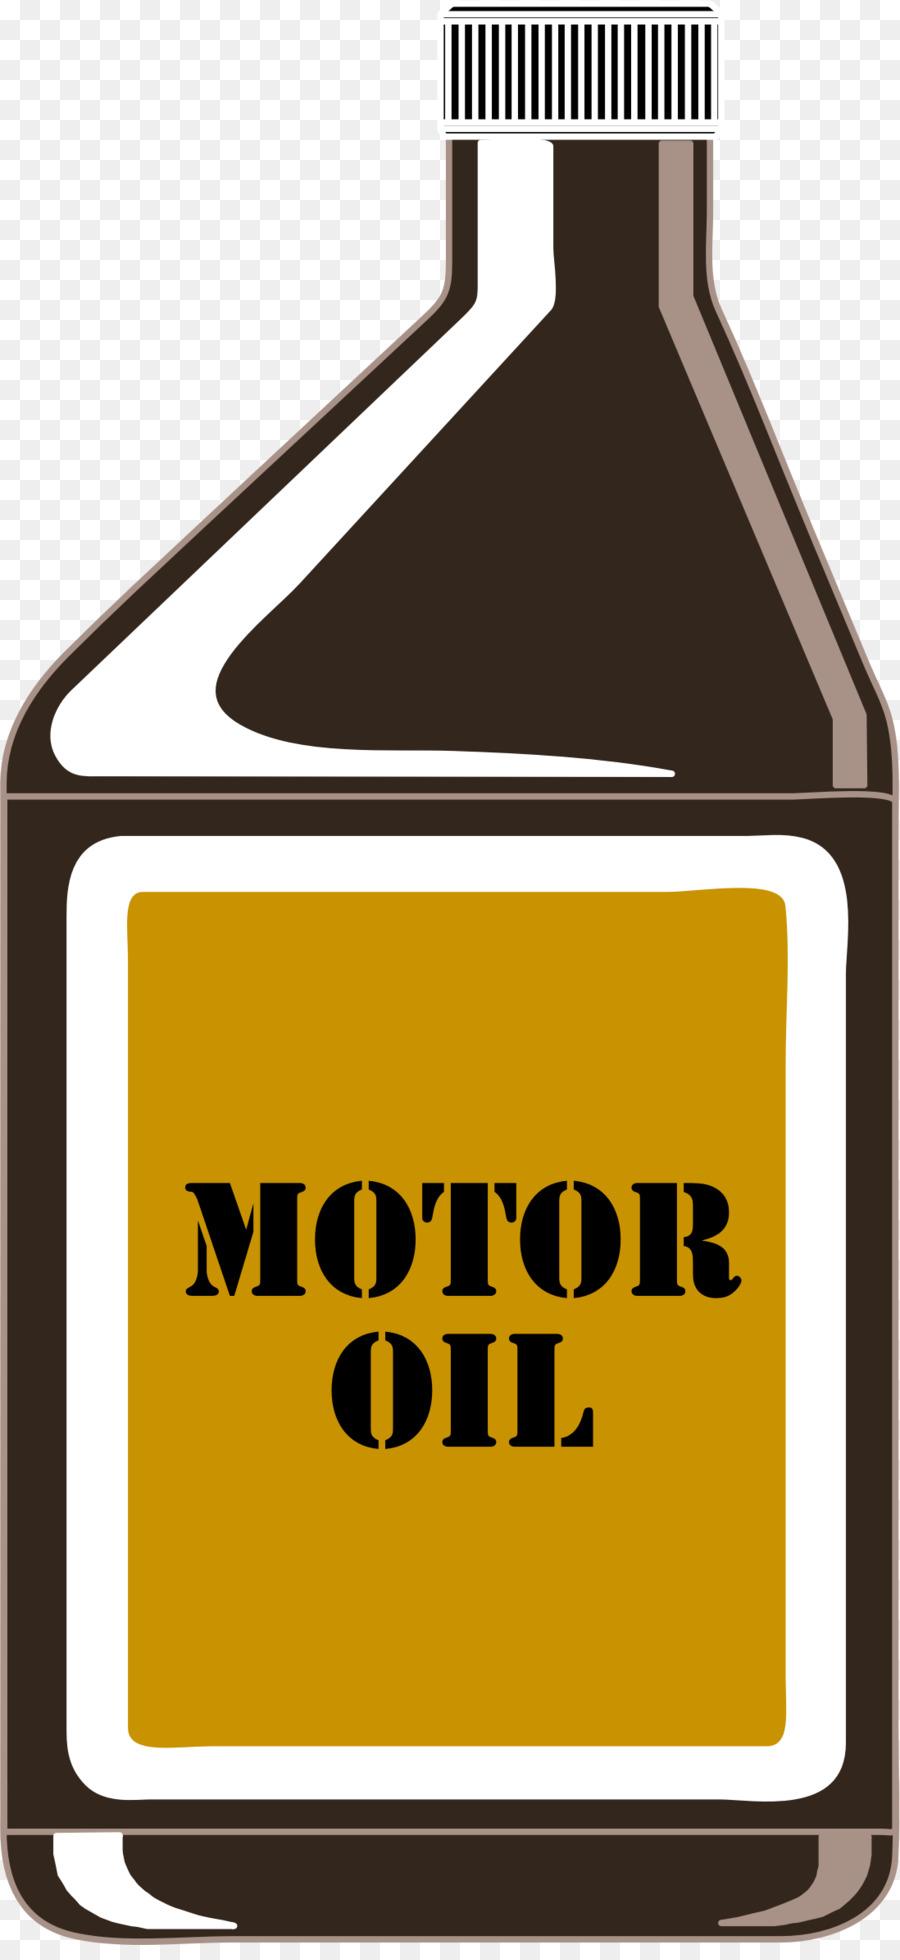 900x1960 Car Motor Oil Computer Icons Clip Art